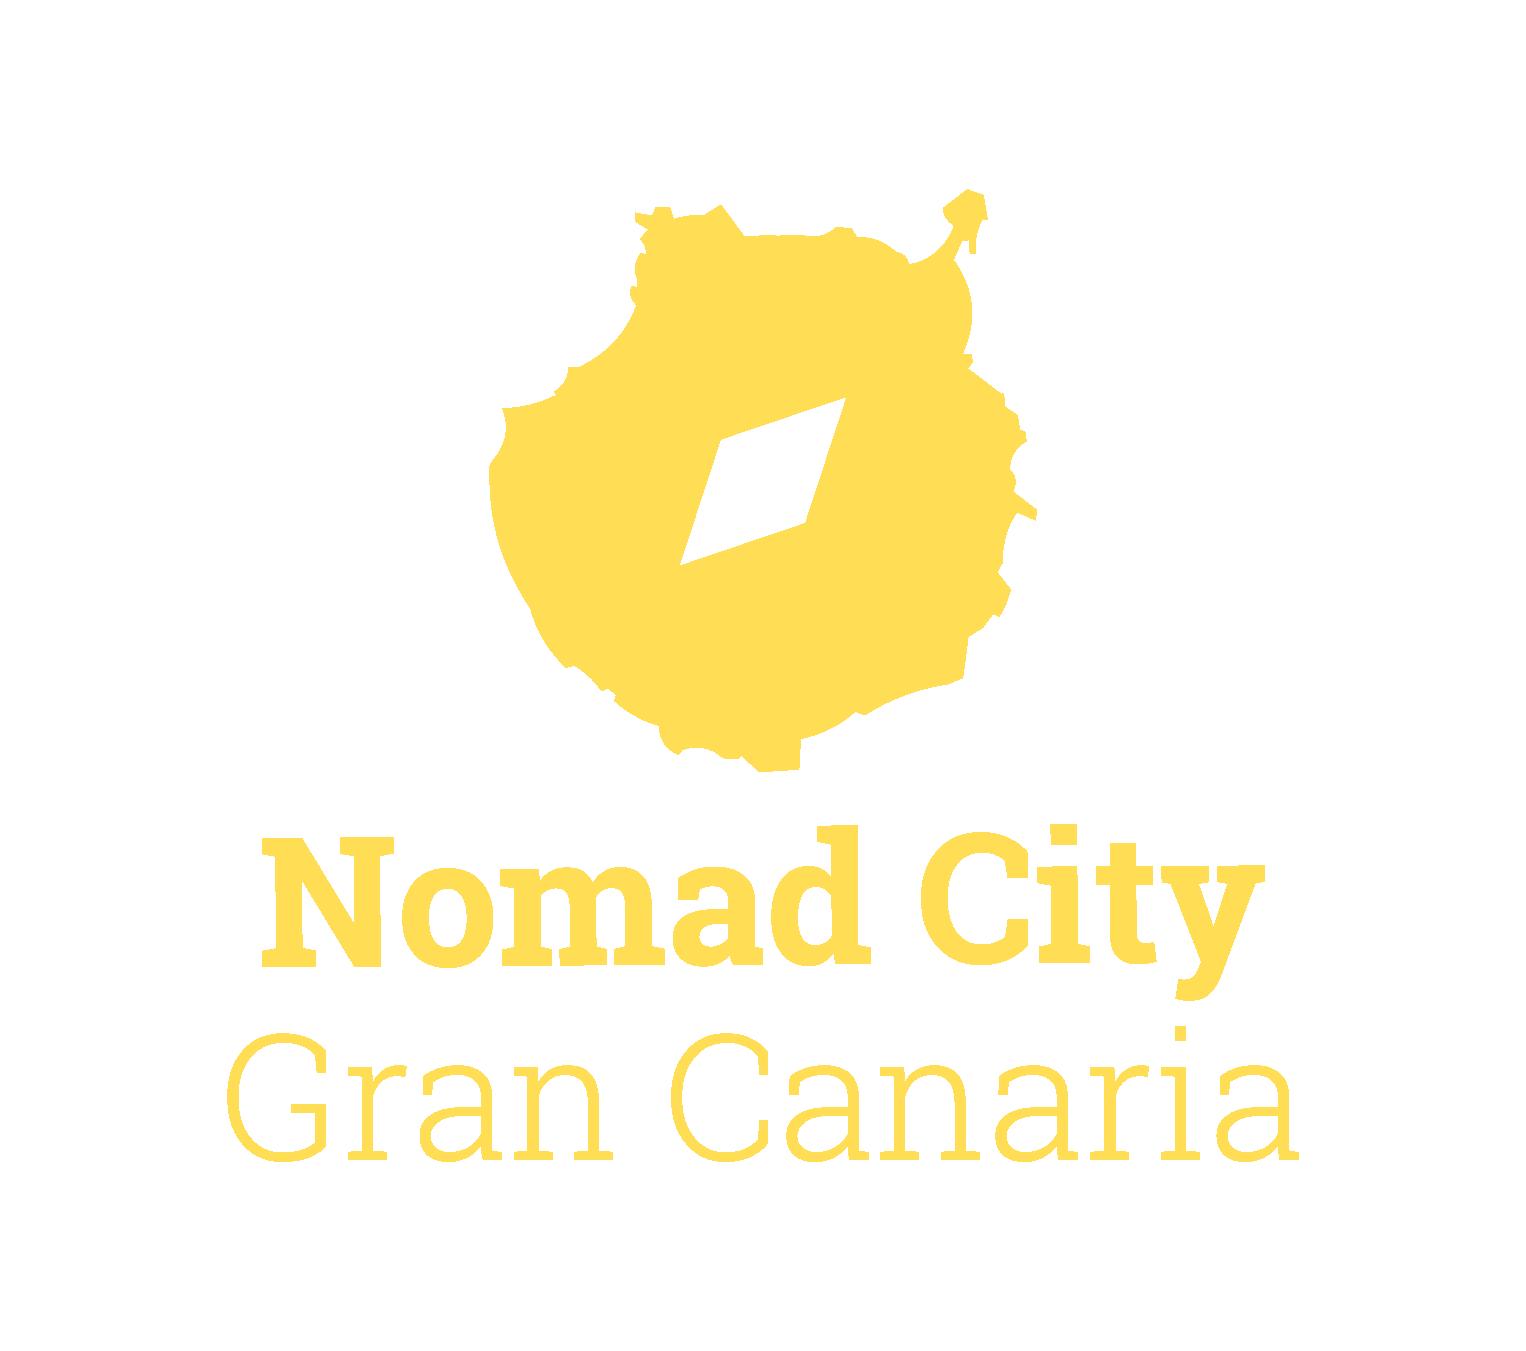 Nomad City Gran Canaria